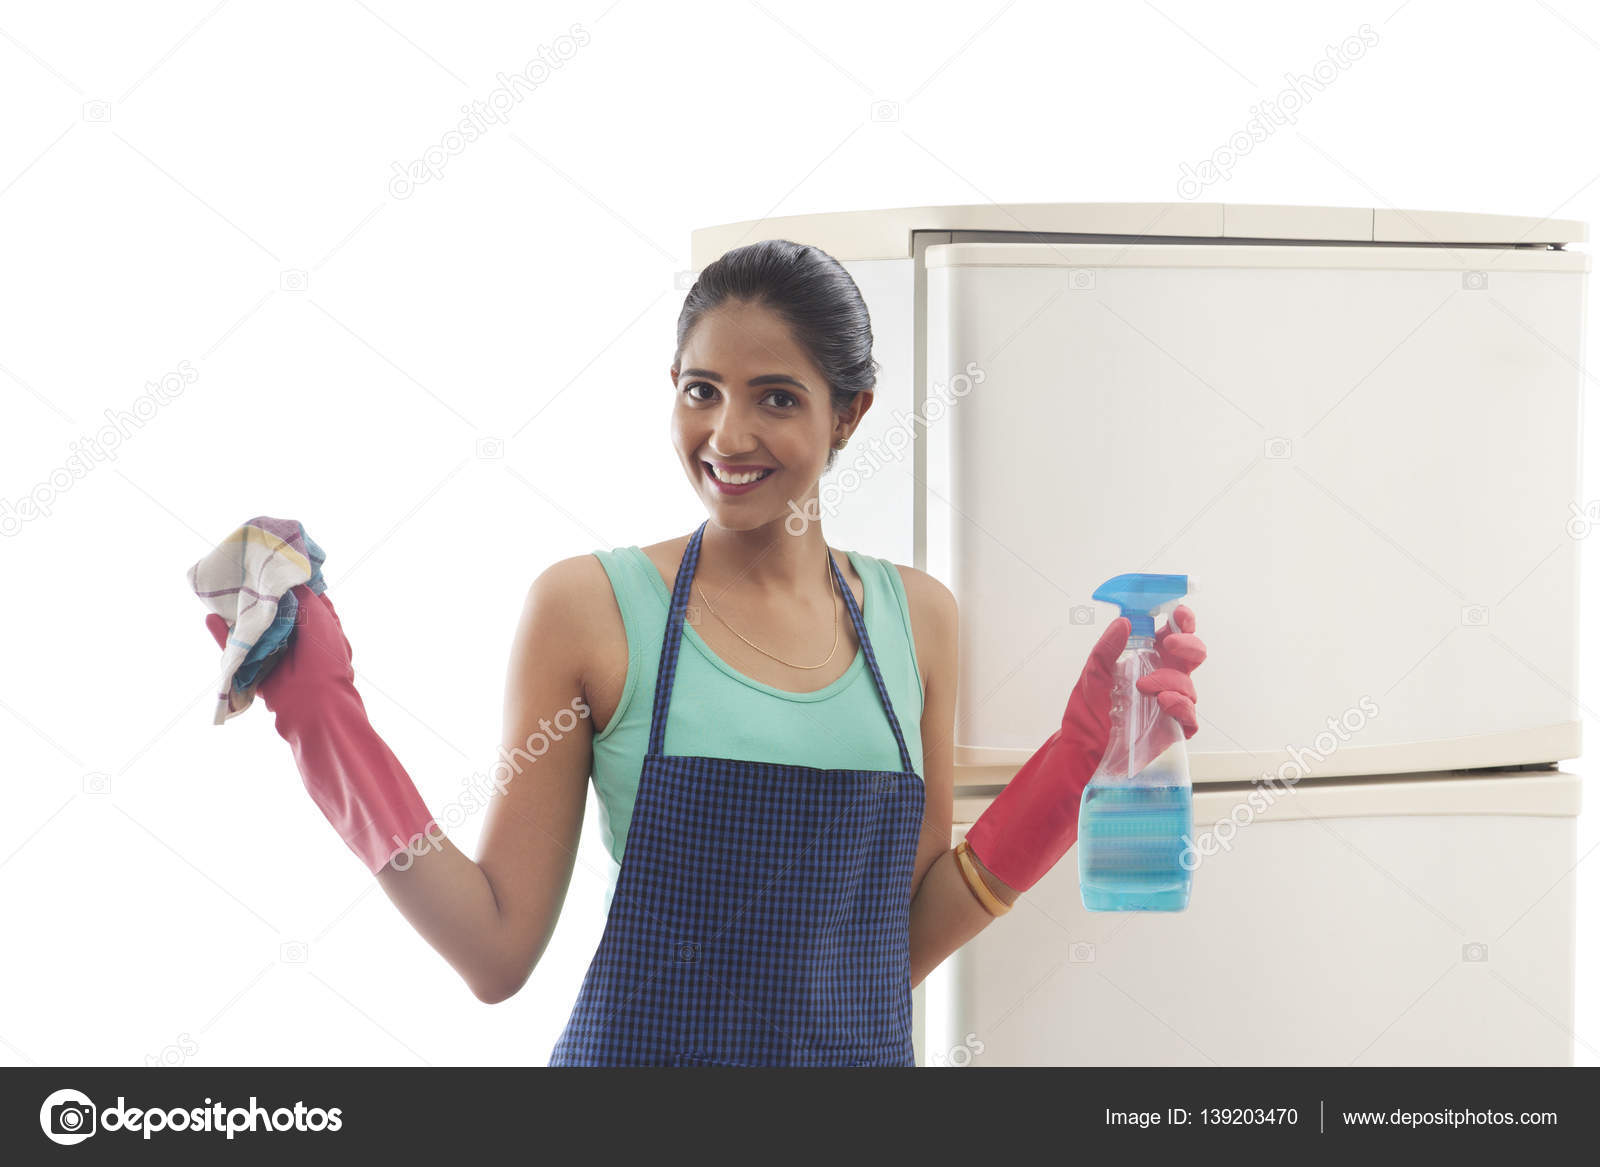 Kühlschrank Reiniger : Frau reinigung kühlschrank u2014 stockfoto © iphemant #139203470